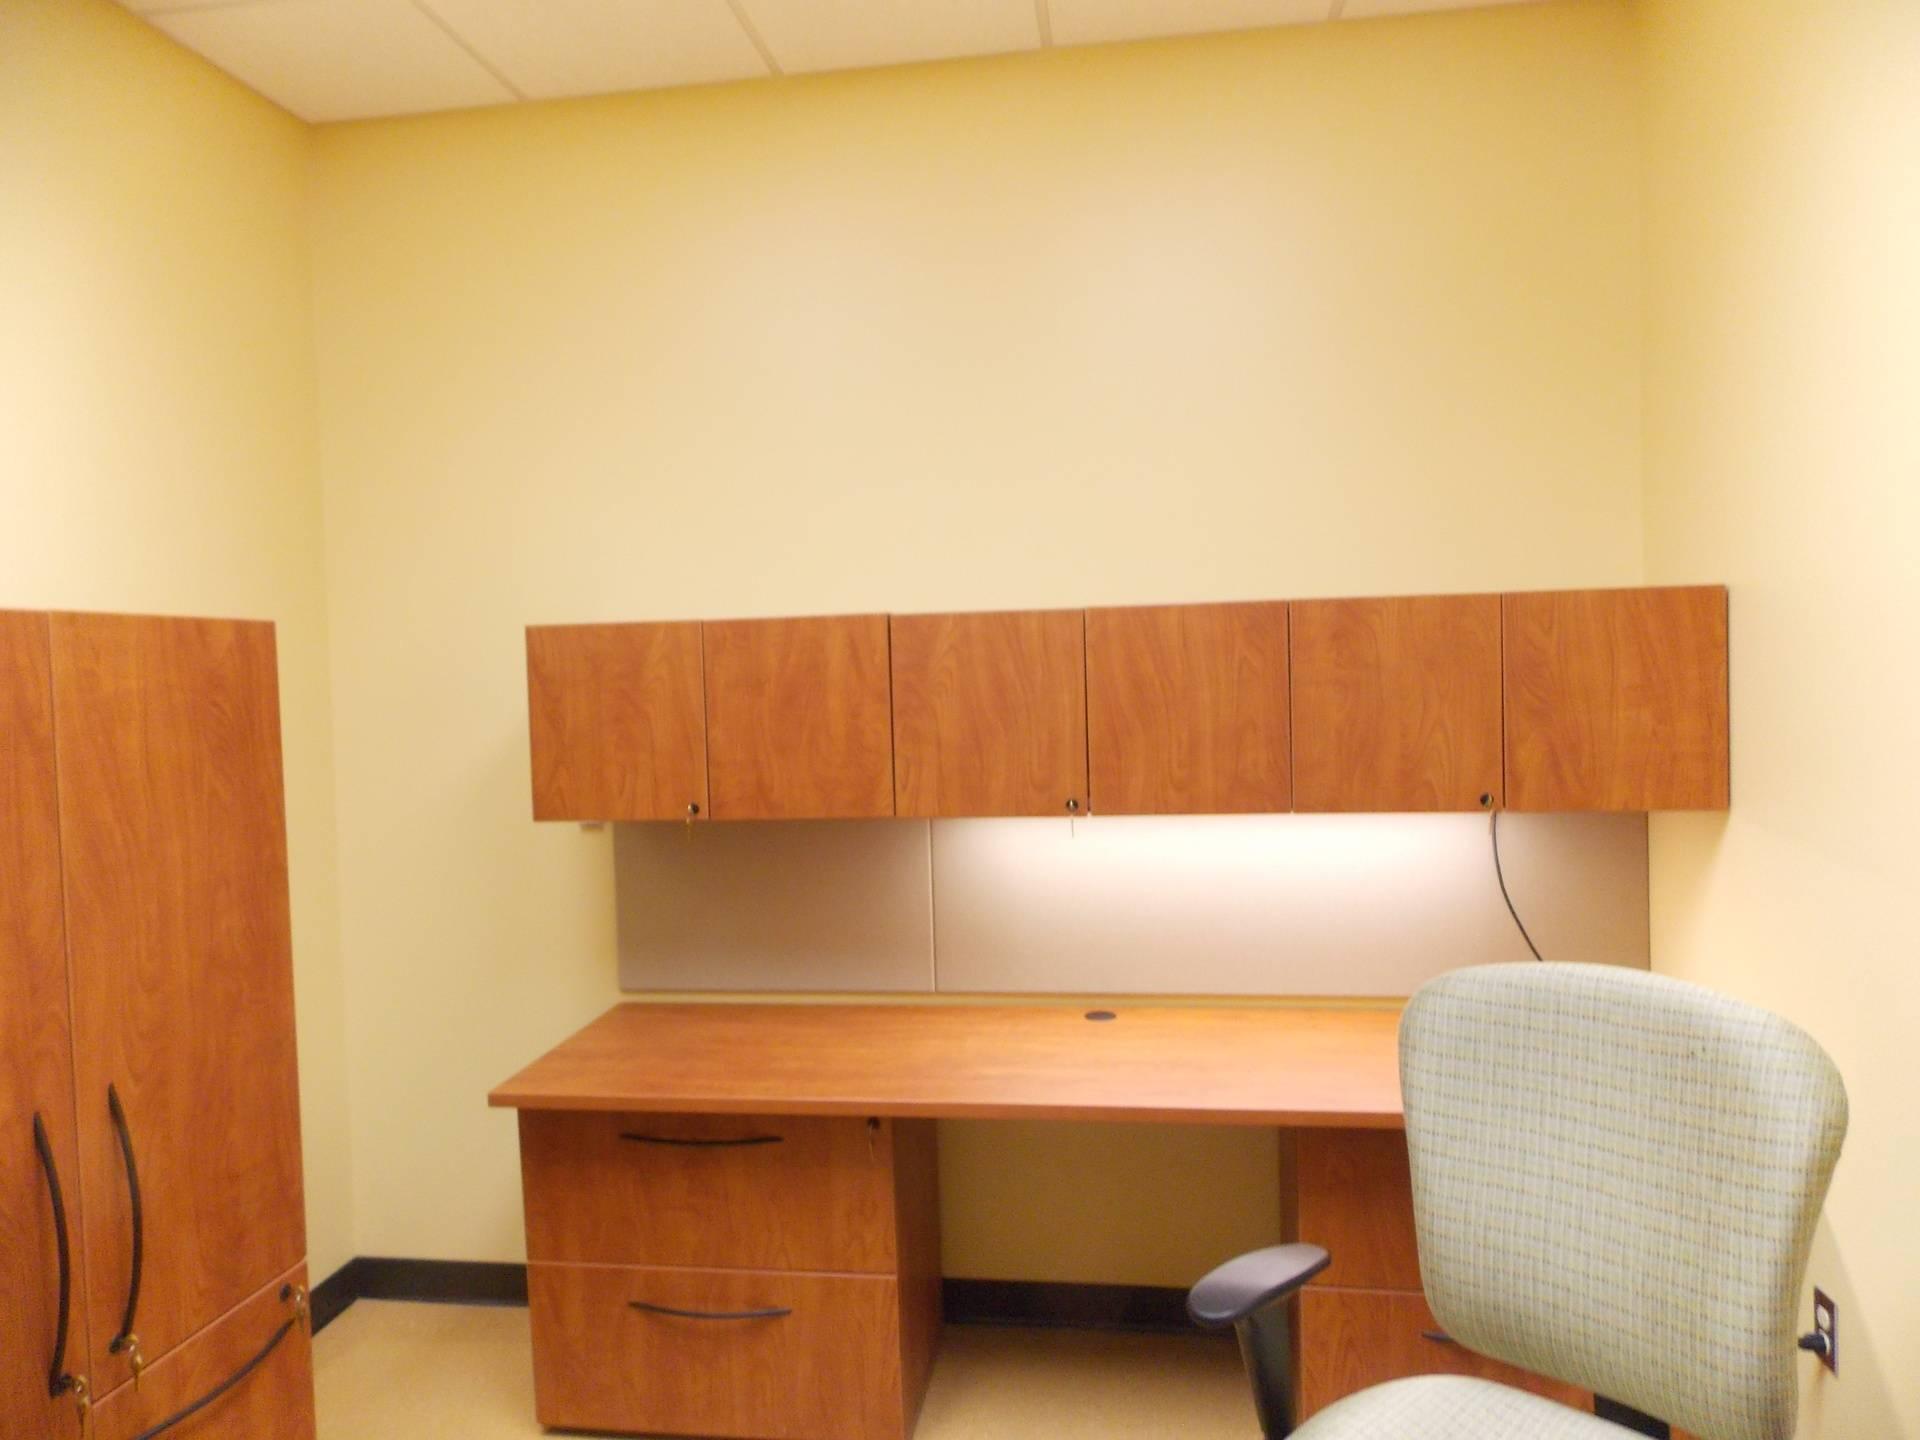 School office Intall